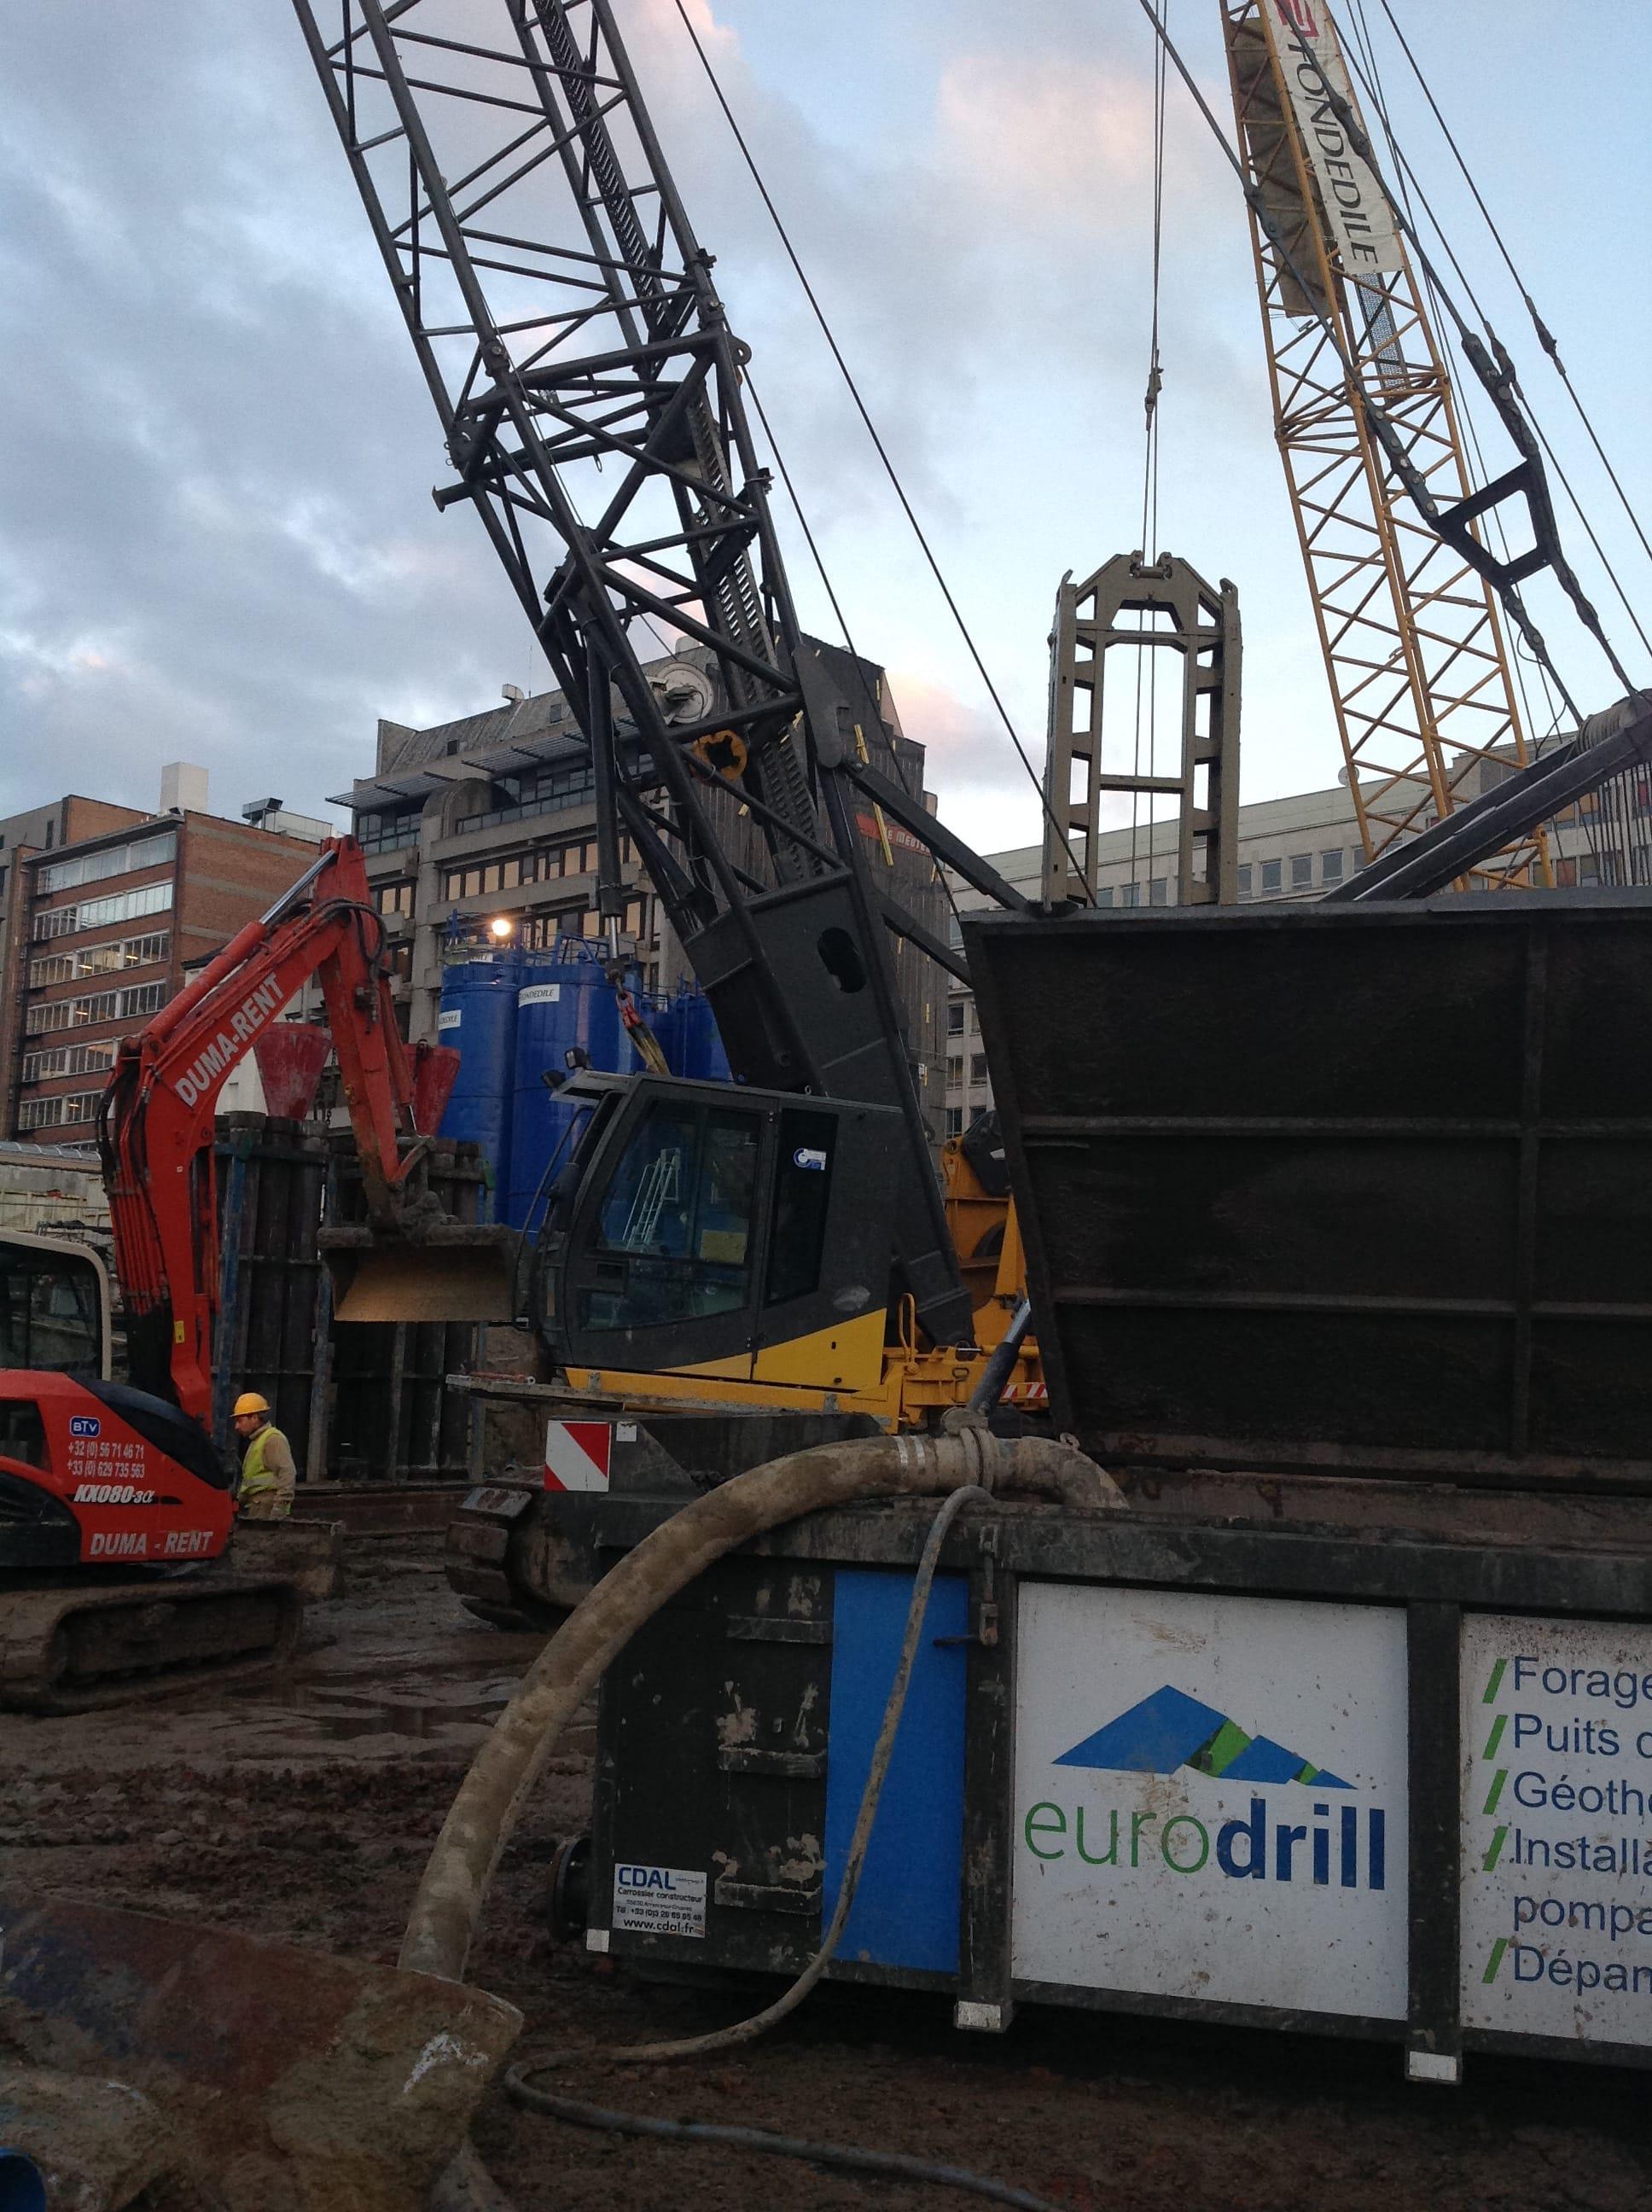 chantier-bruxelles-forage-installation-pompe-puits-geothermie-eurodrill-liege-belgique-7